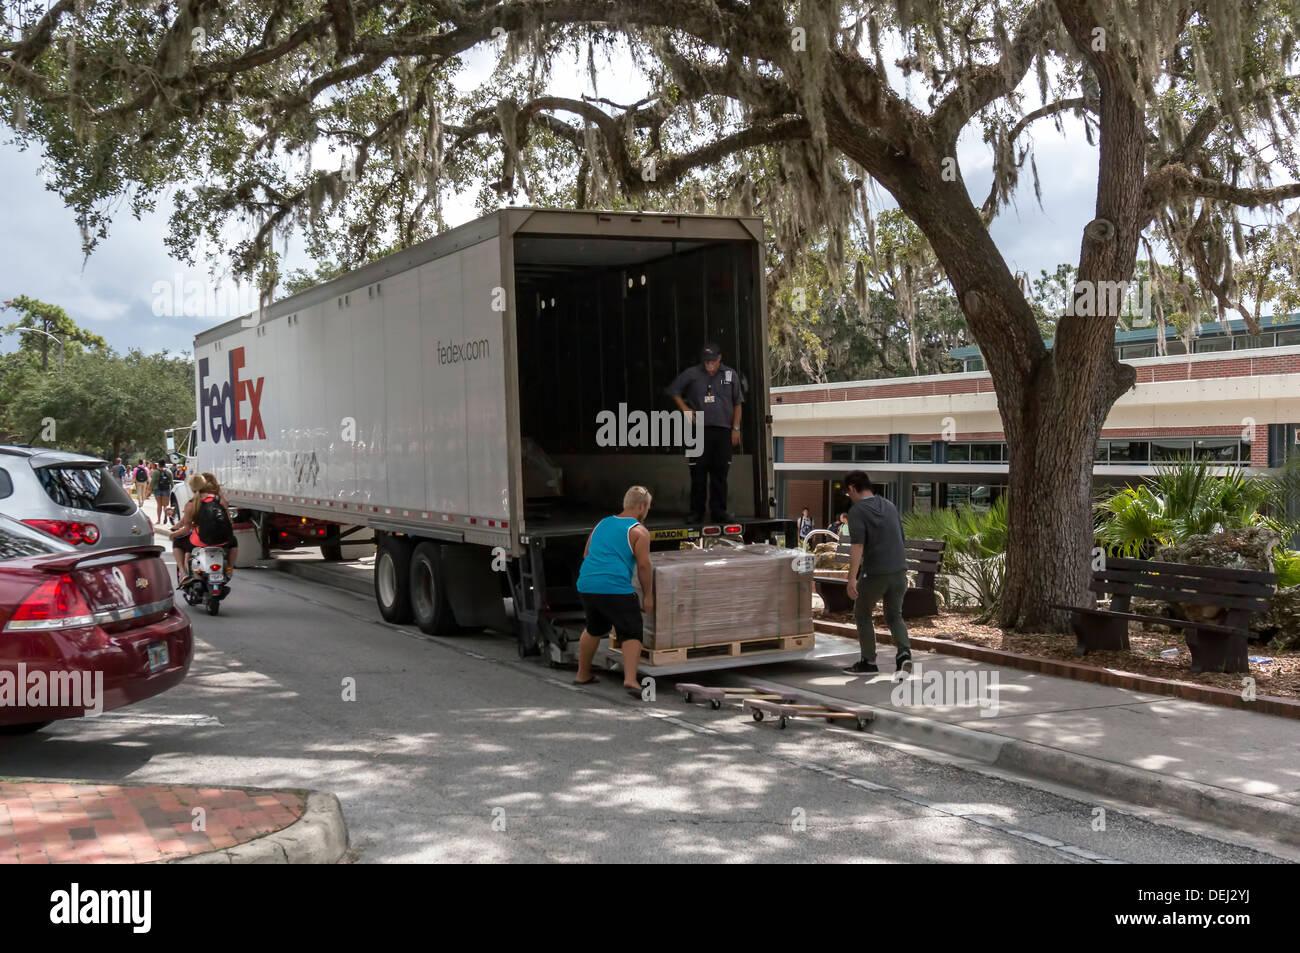 Fedex Freight Stockfotos & Fedex Freight Bilder - Alamy